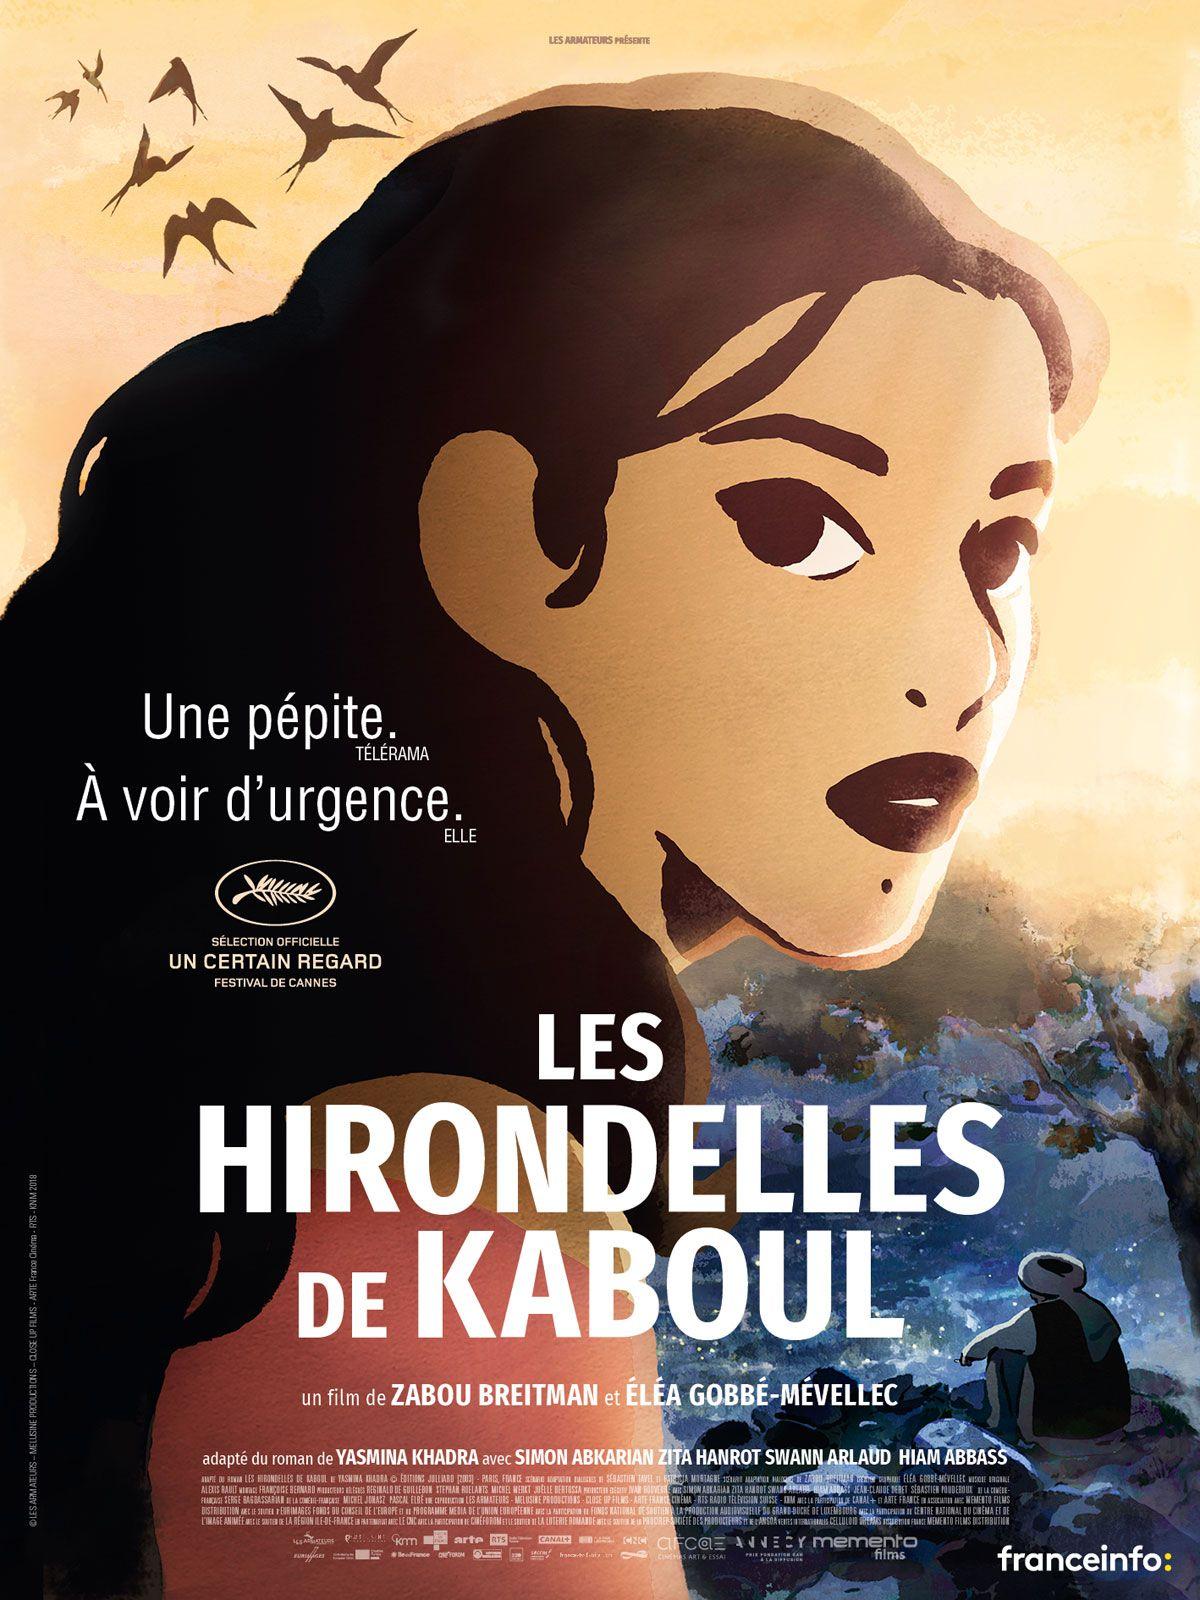 Les hirondelles de Kaboul de Zabou Breitman, Eléa Gobbé